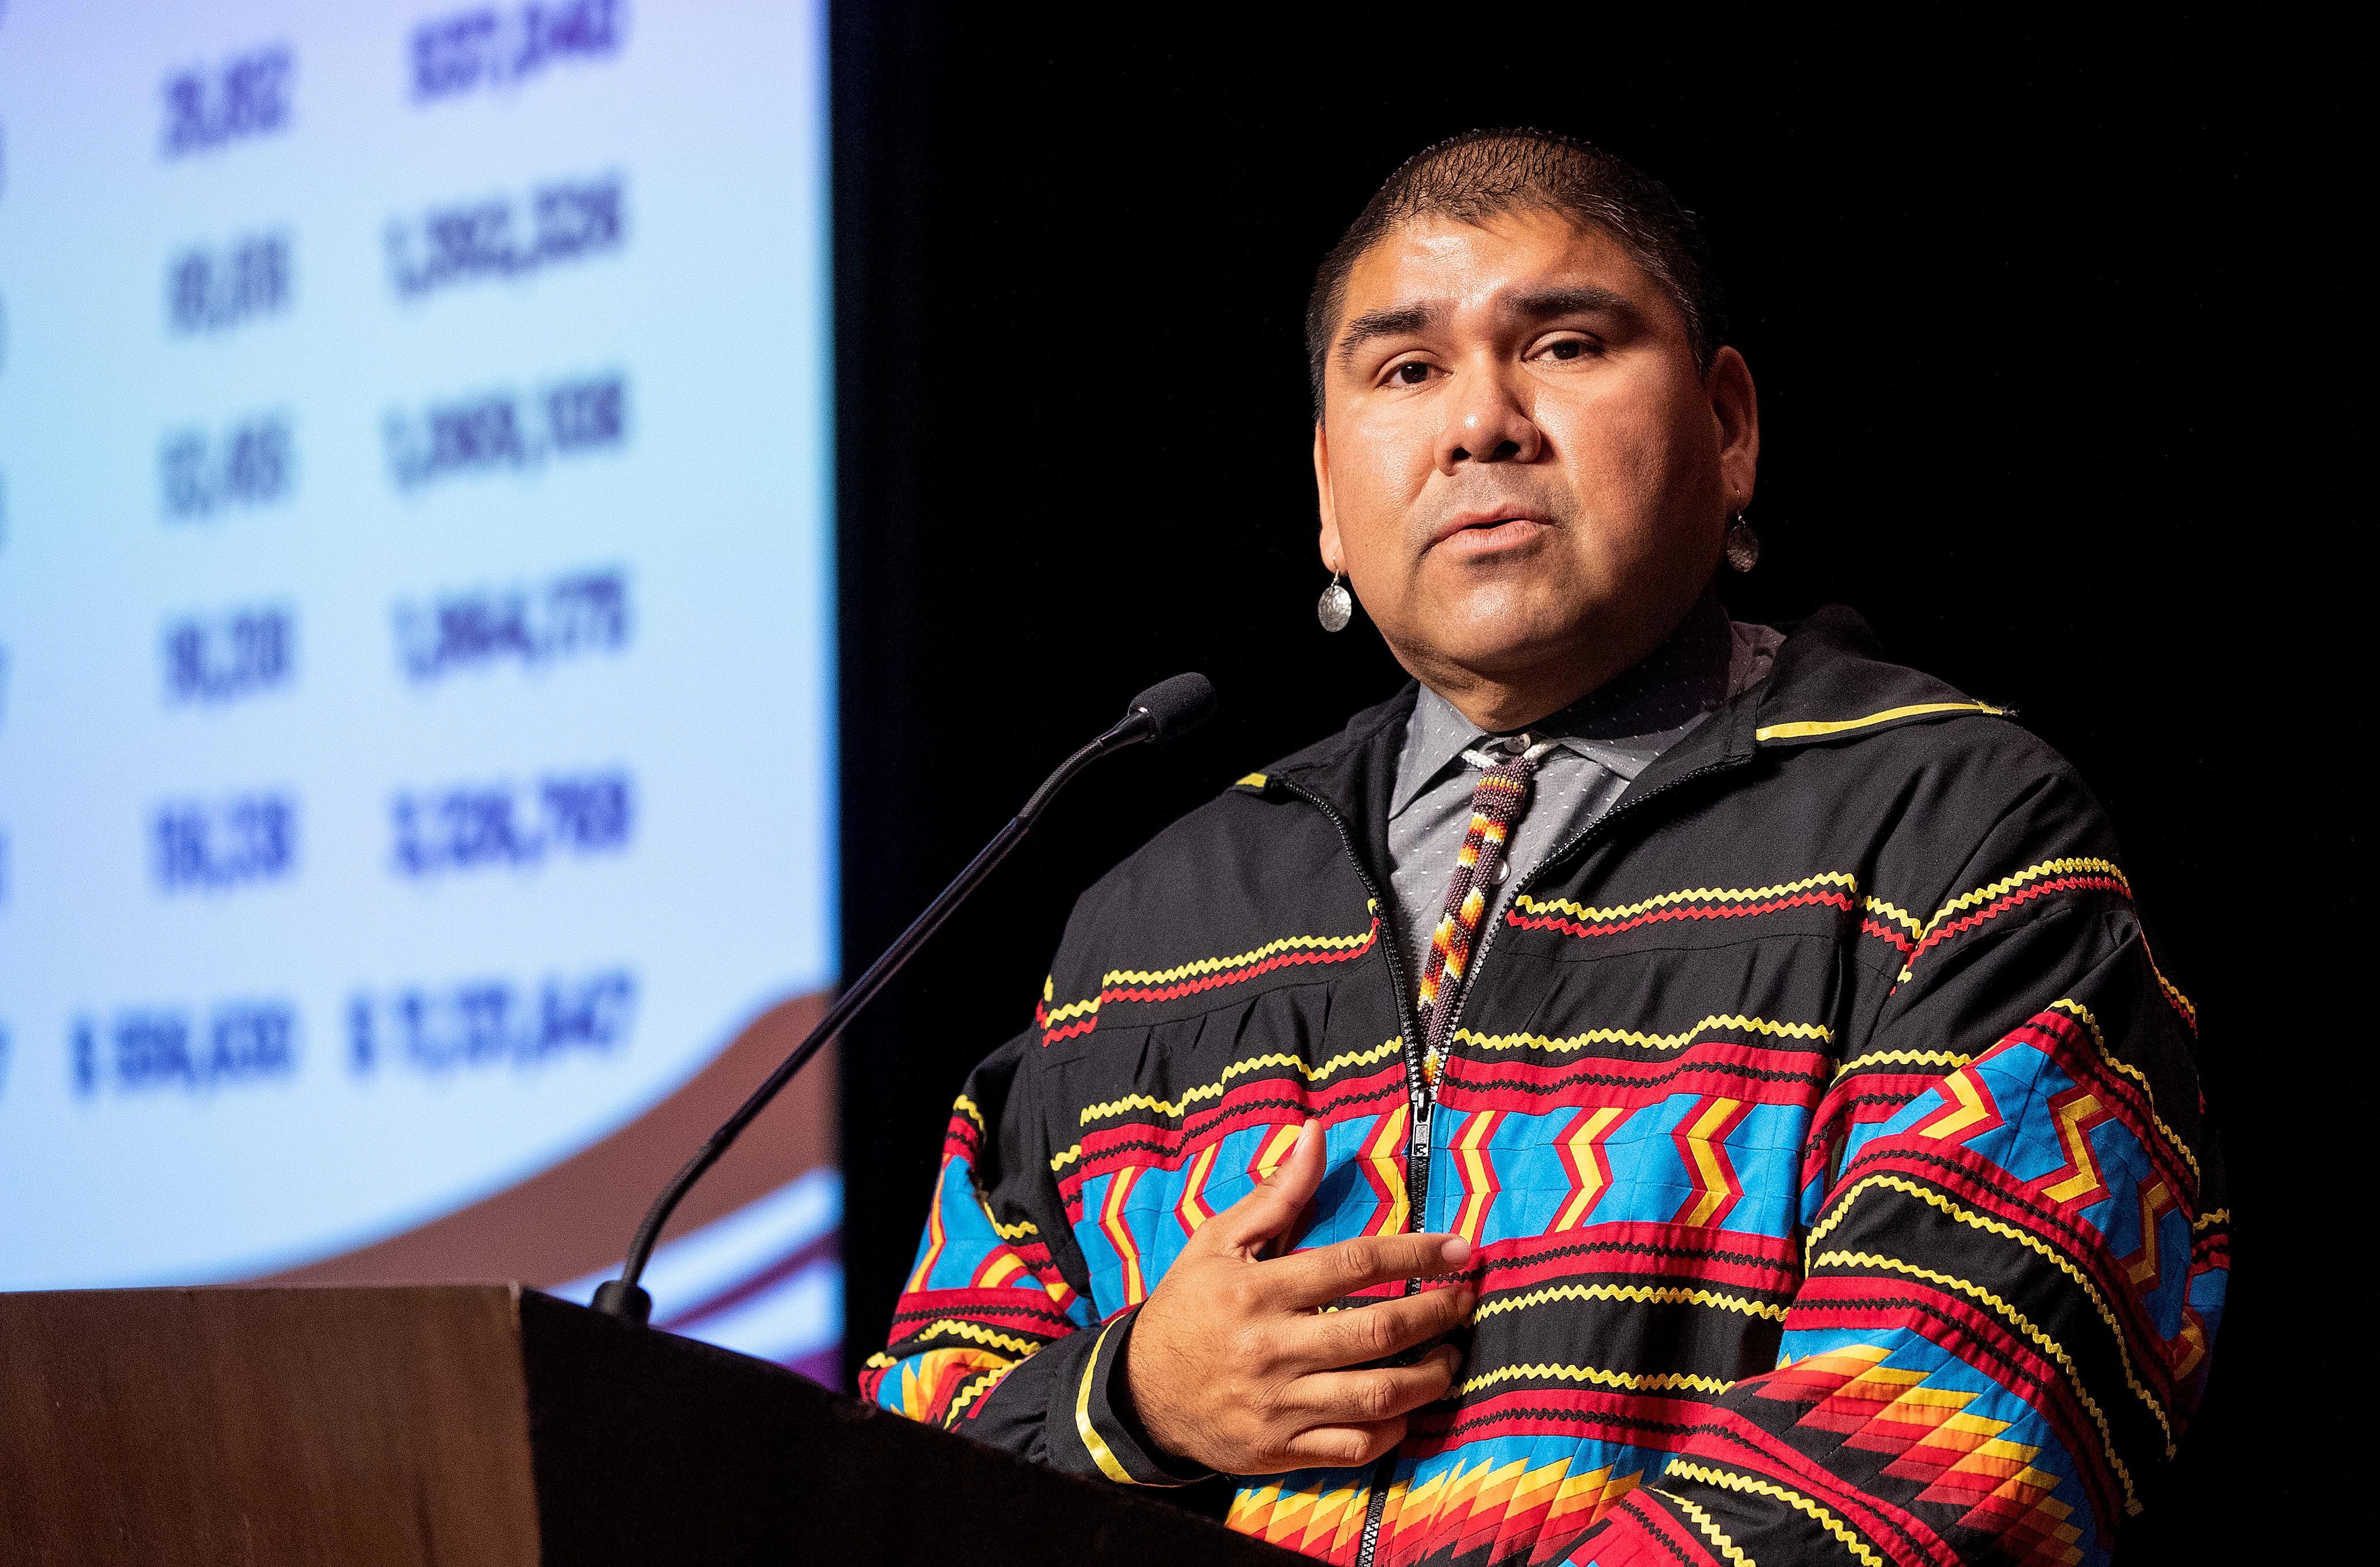 Rev. Chebon Kernell, Director Ejecutivo del Plan Ampliado Nativo-Americano. Foto Mike DuBose, Noticias MU.